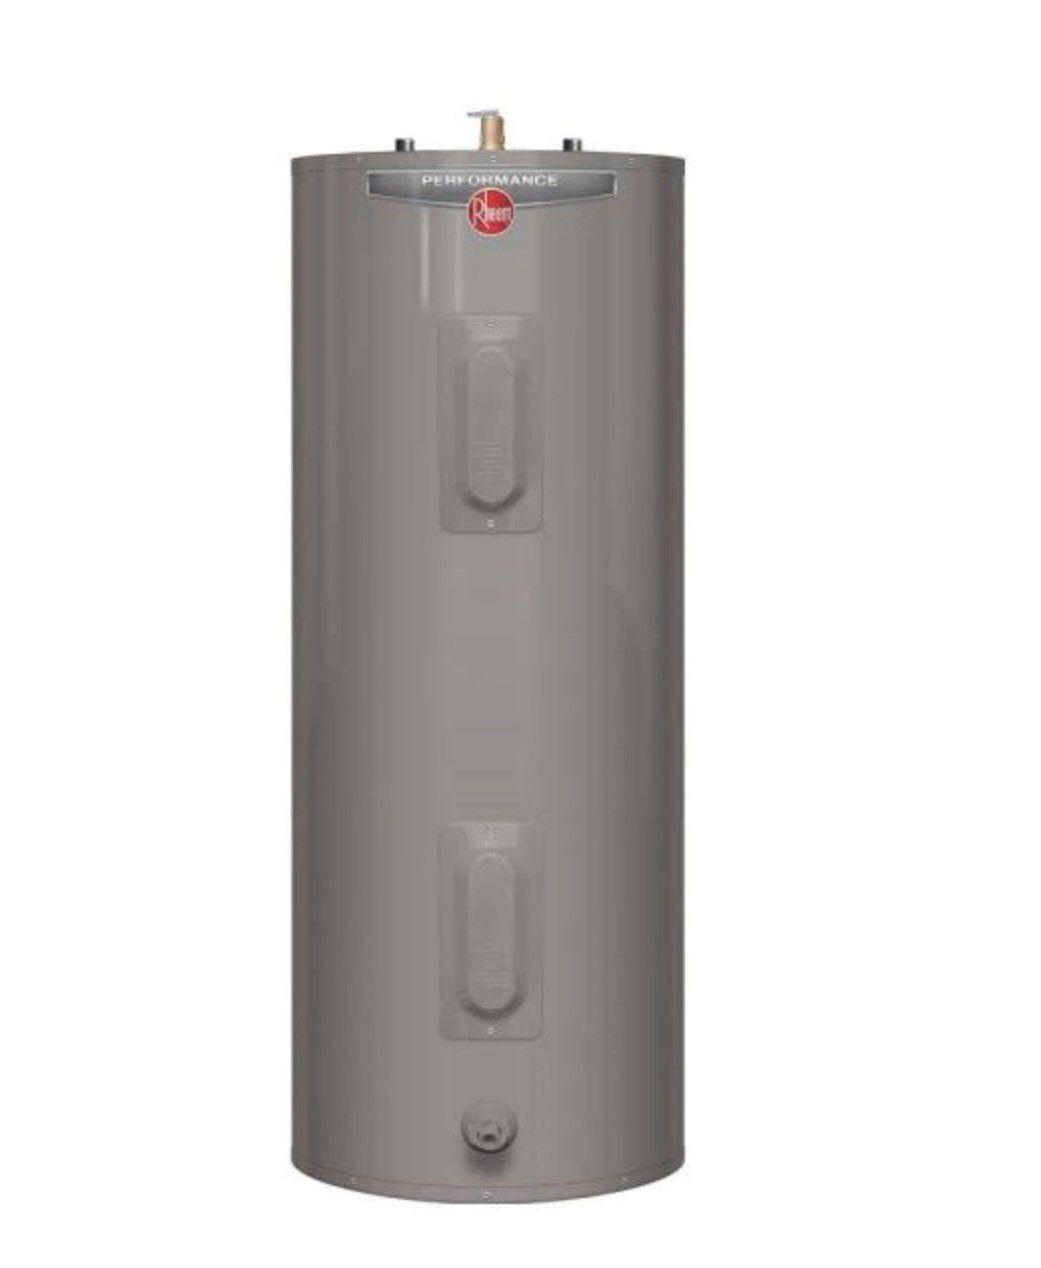 Rheem Performance Electric Tank Water Heater